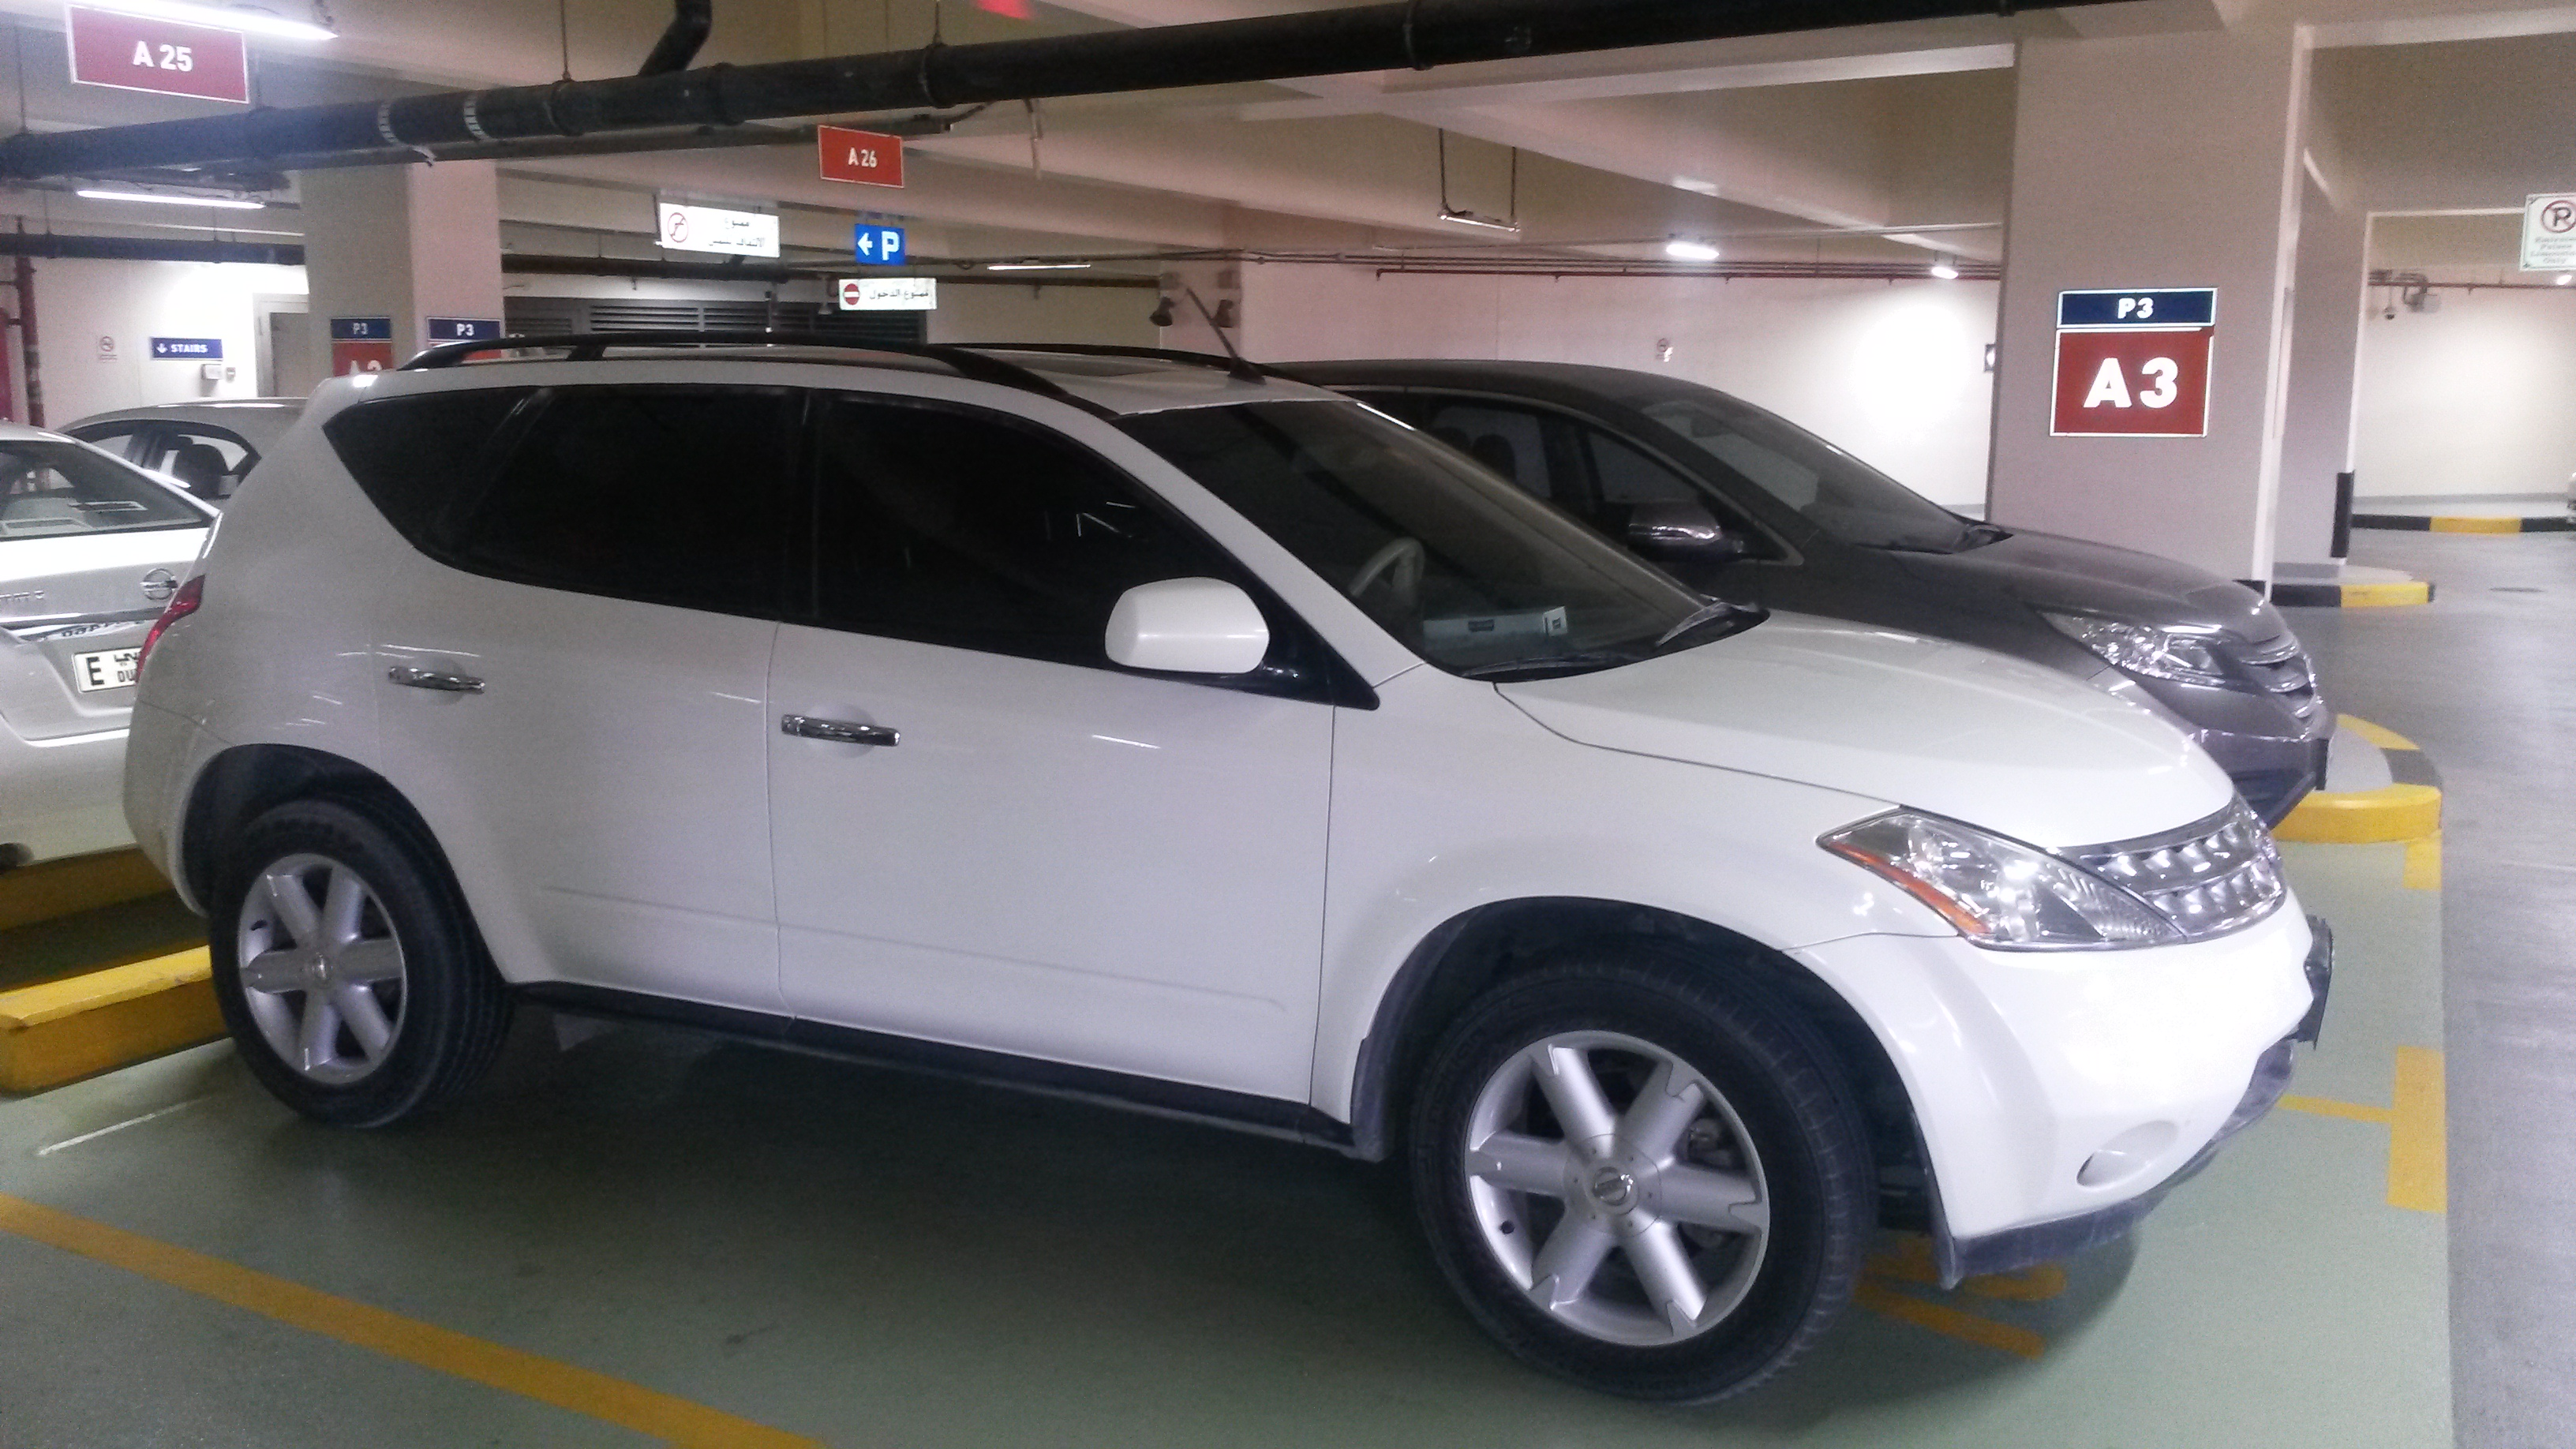 convertible beyond listings for img nissan full awd motors sl sale murano